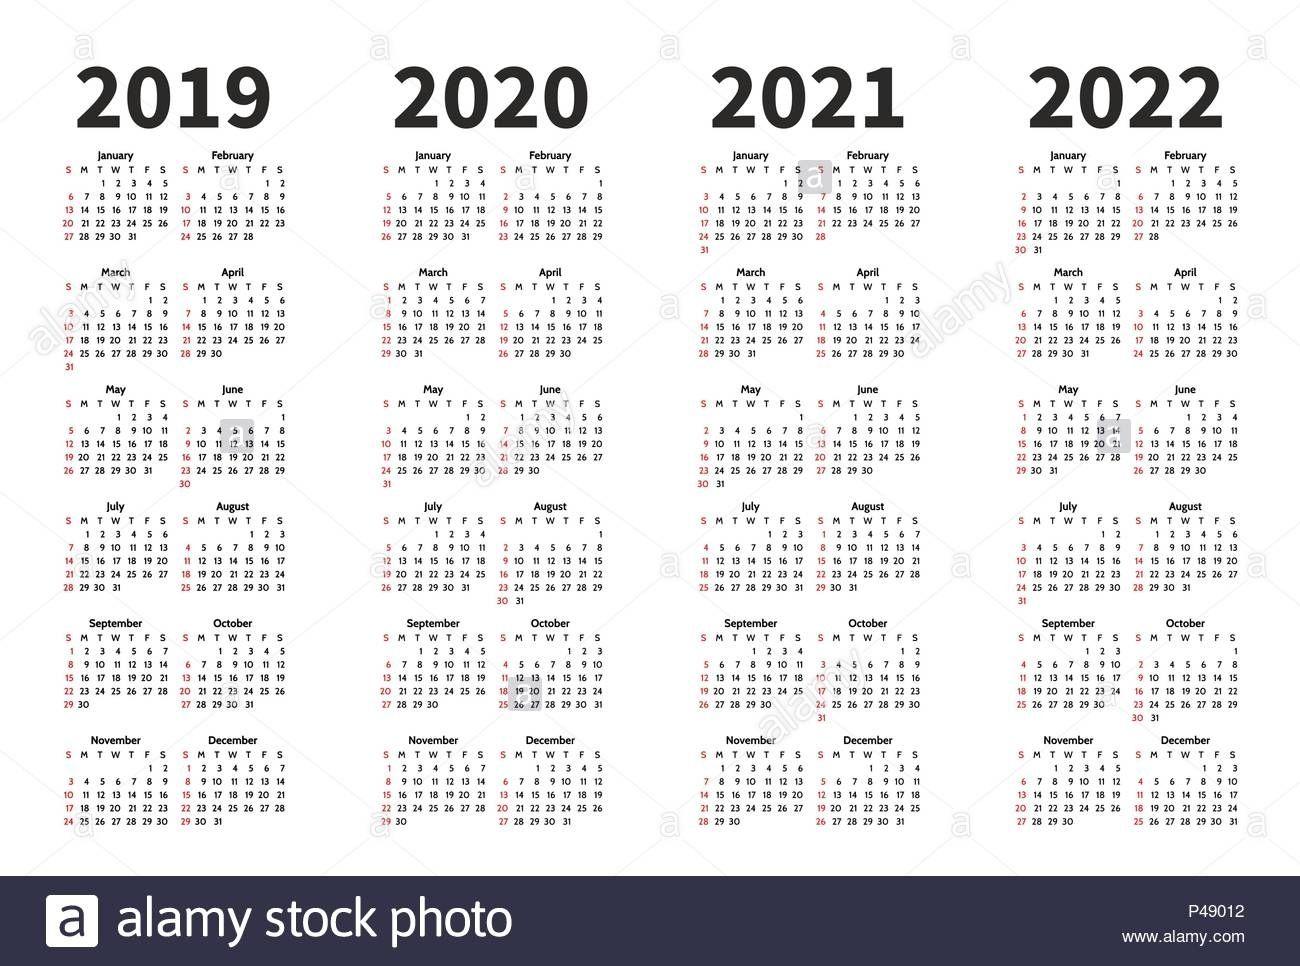 Exceptional 4 Year Calendar 2019 To 2020 In 2020 Calendar Printables Calendar Template Blank Calendar Template